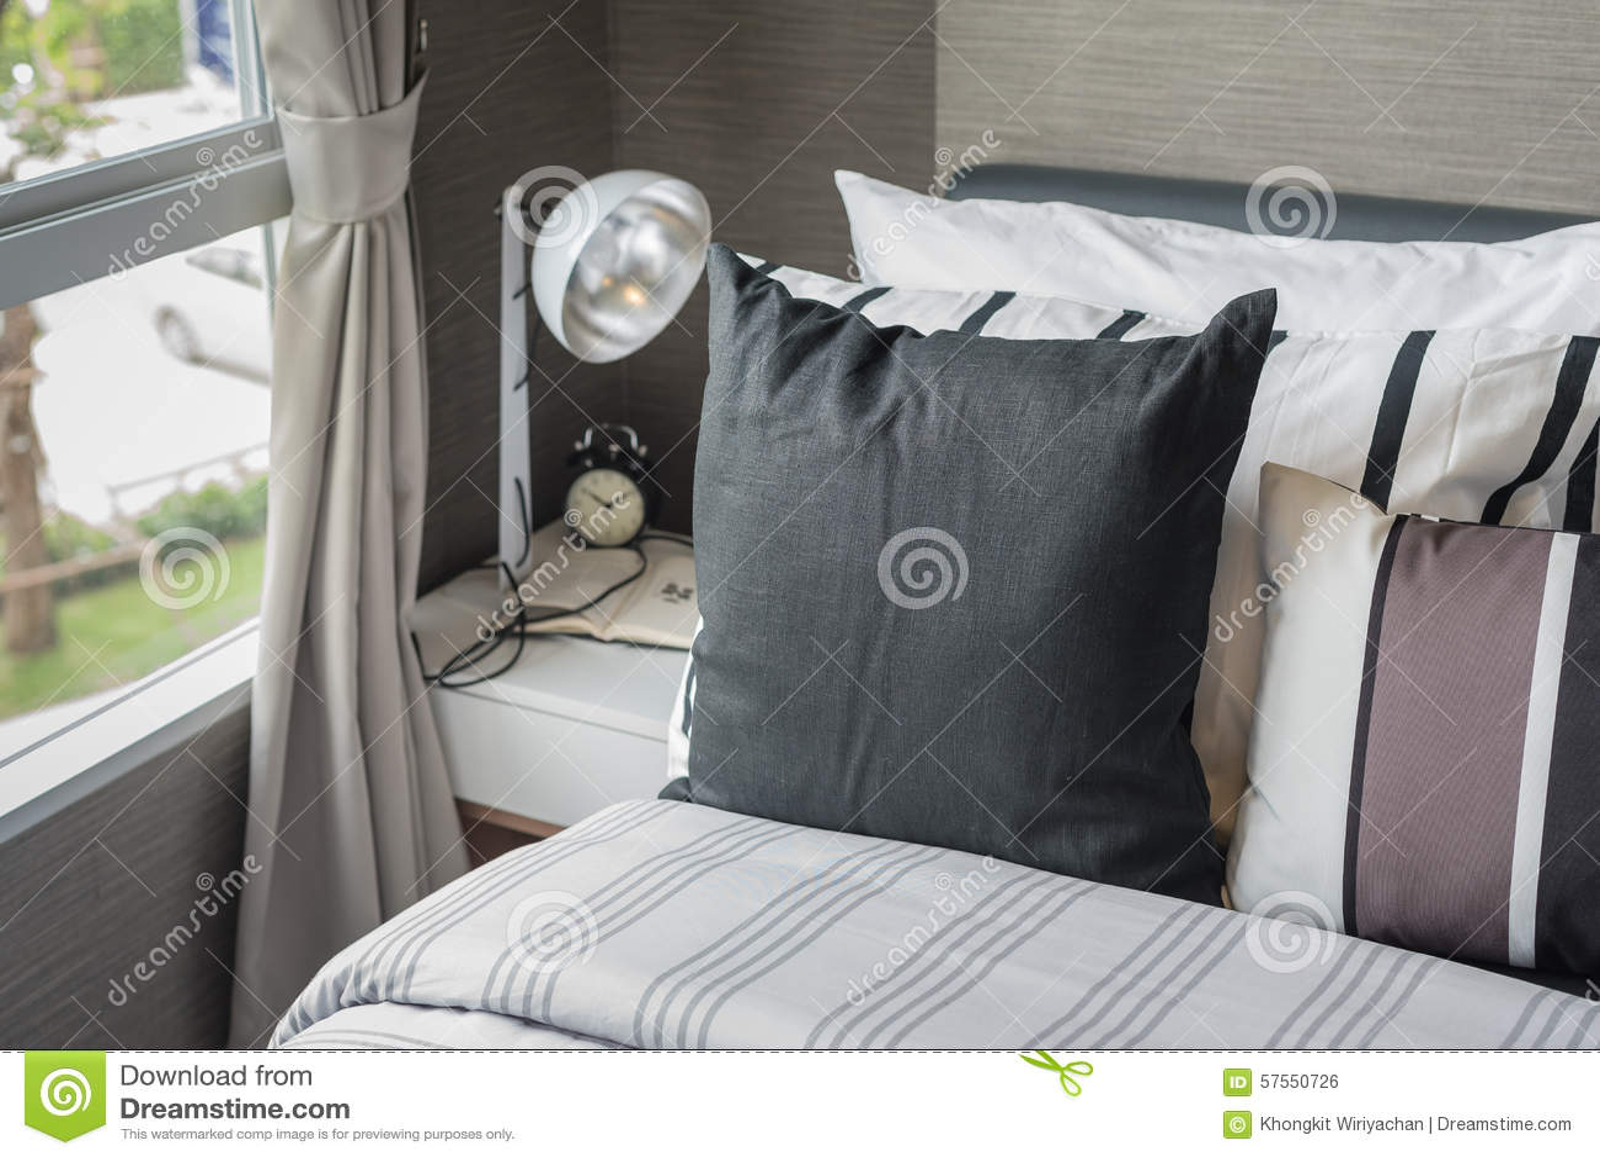 Svart Kudde På Modern Säng I Sovrum Arkivfoto - Bild: 57550726